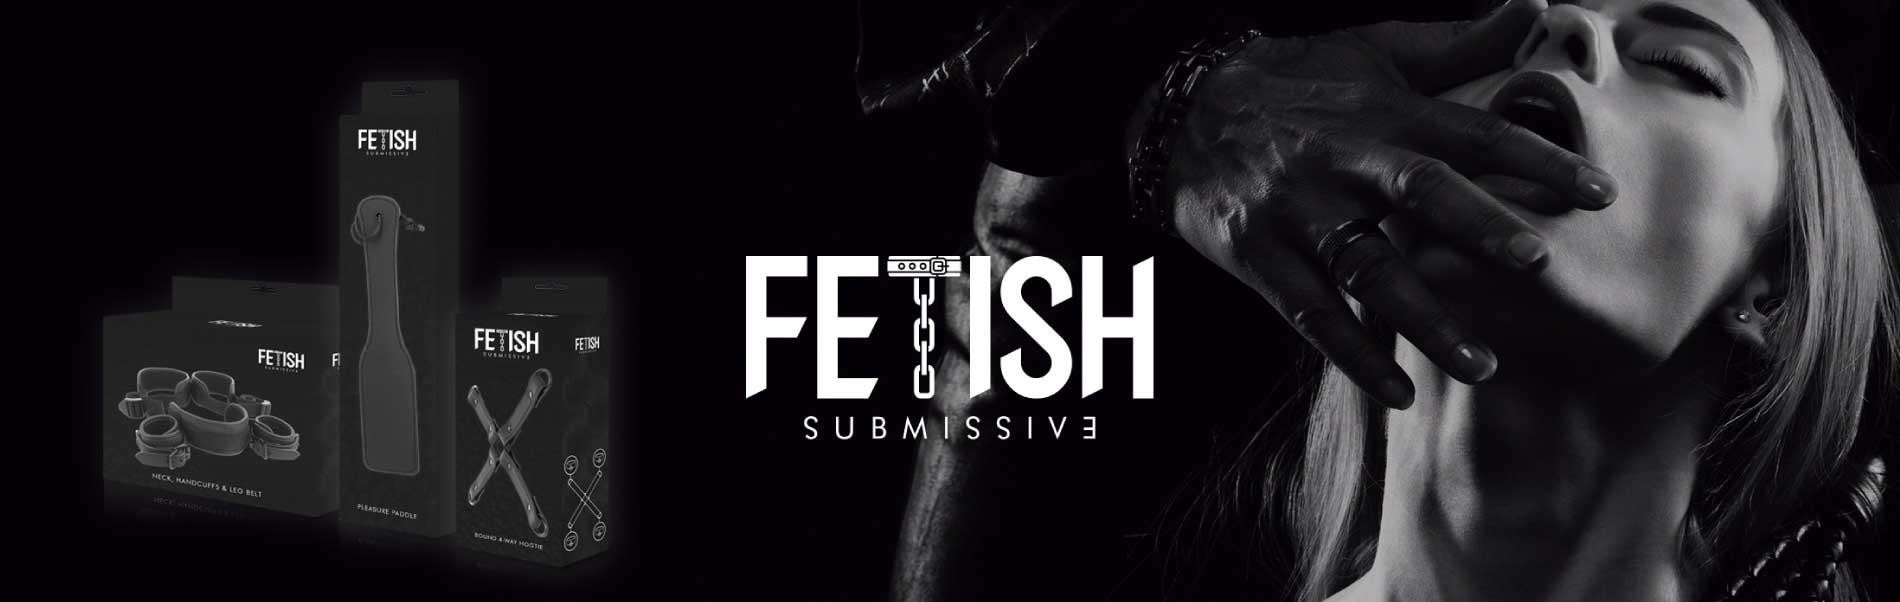 BDSM Fetish Submissive